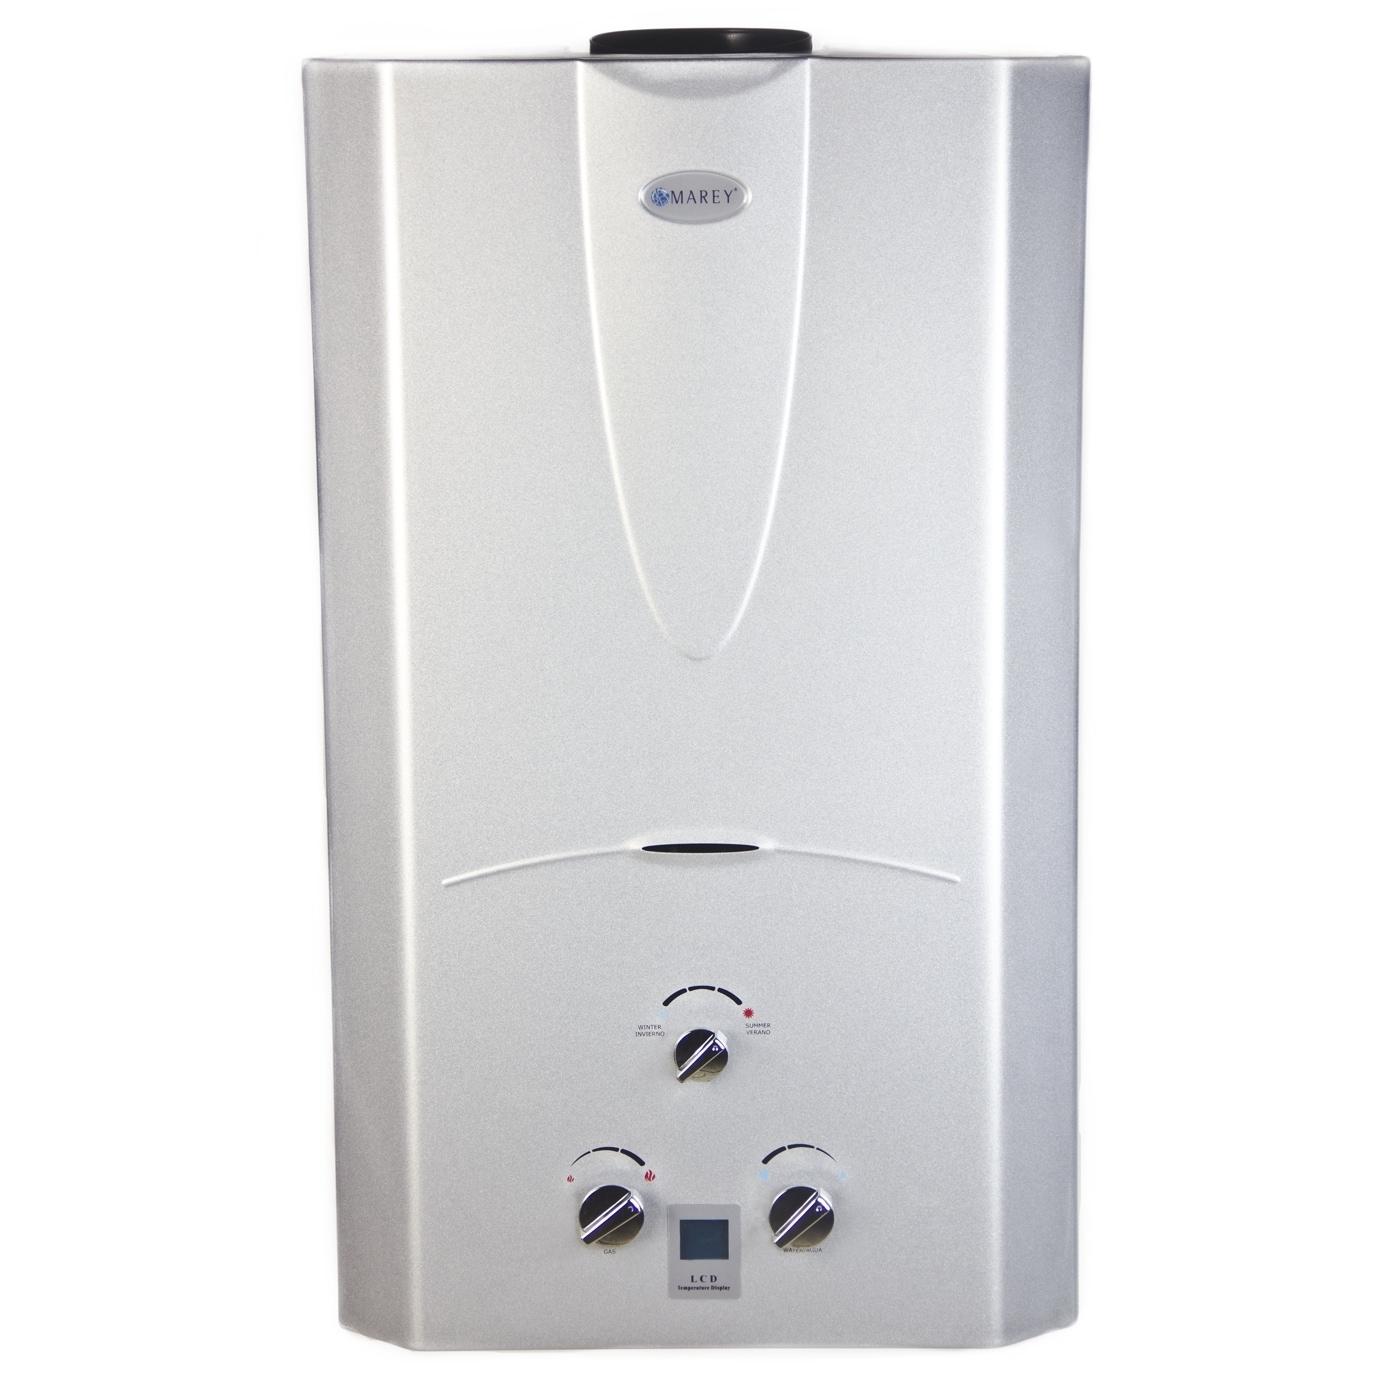 Marey Power Gas 16L Liquid Propane Tankless Water Heater ...